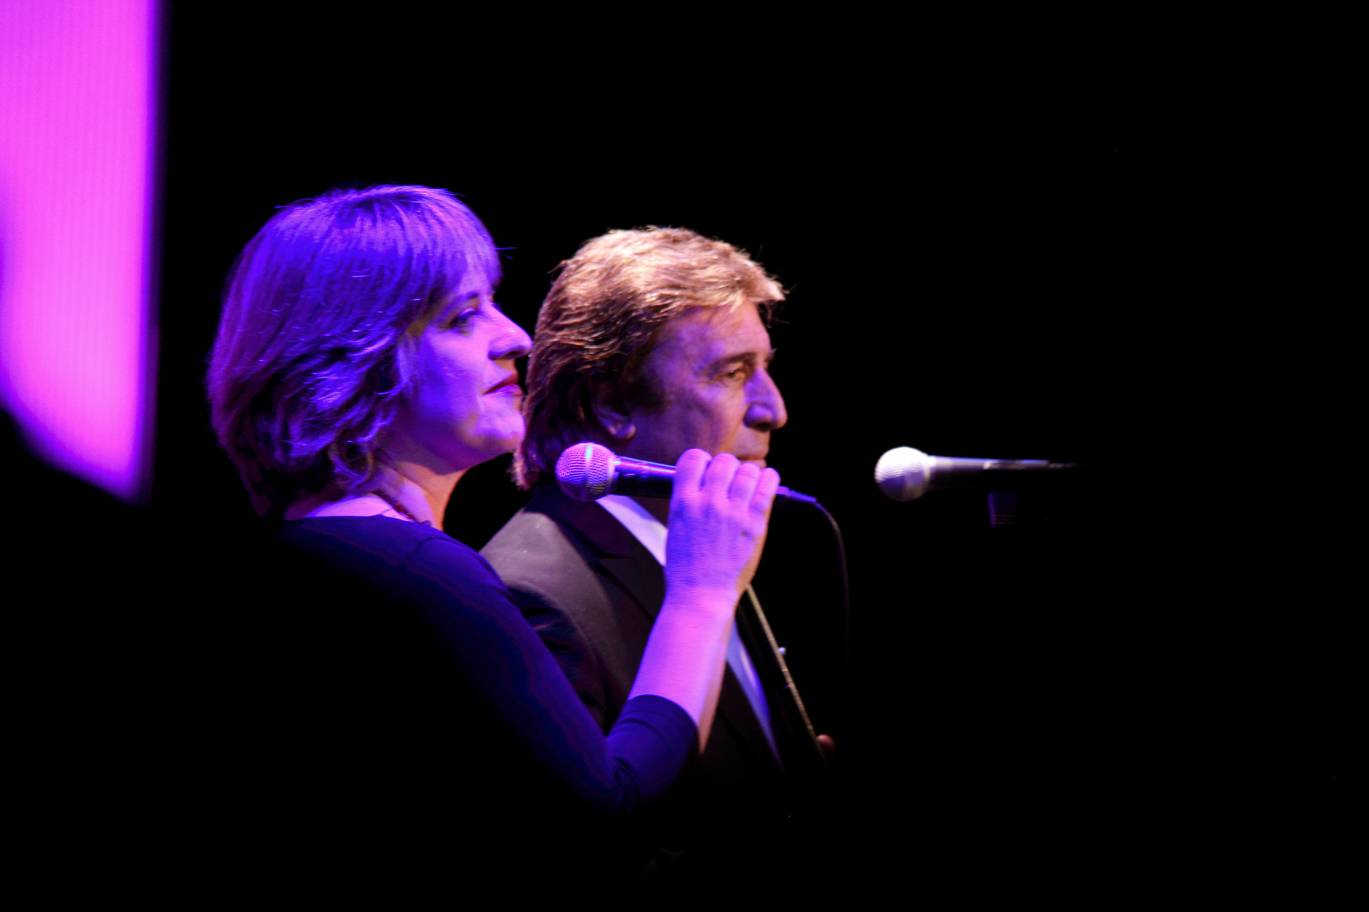 Ana Vassalo y Rubén Melogno